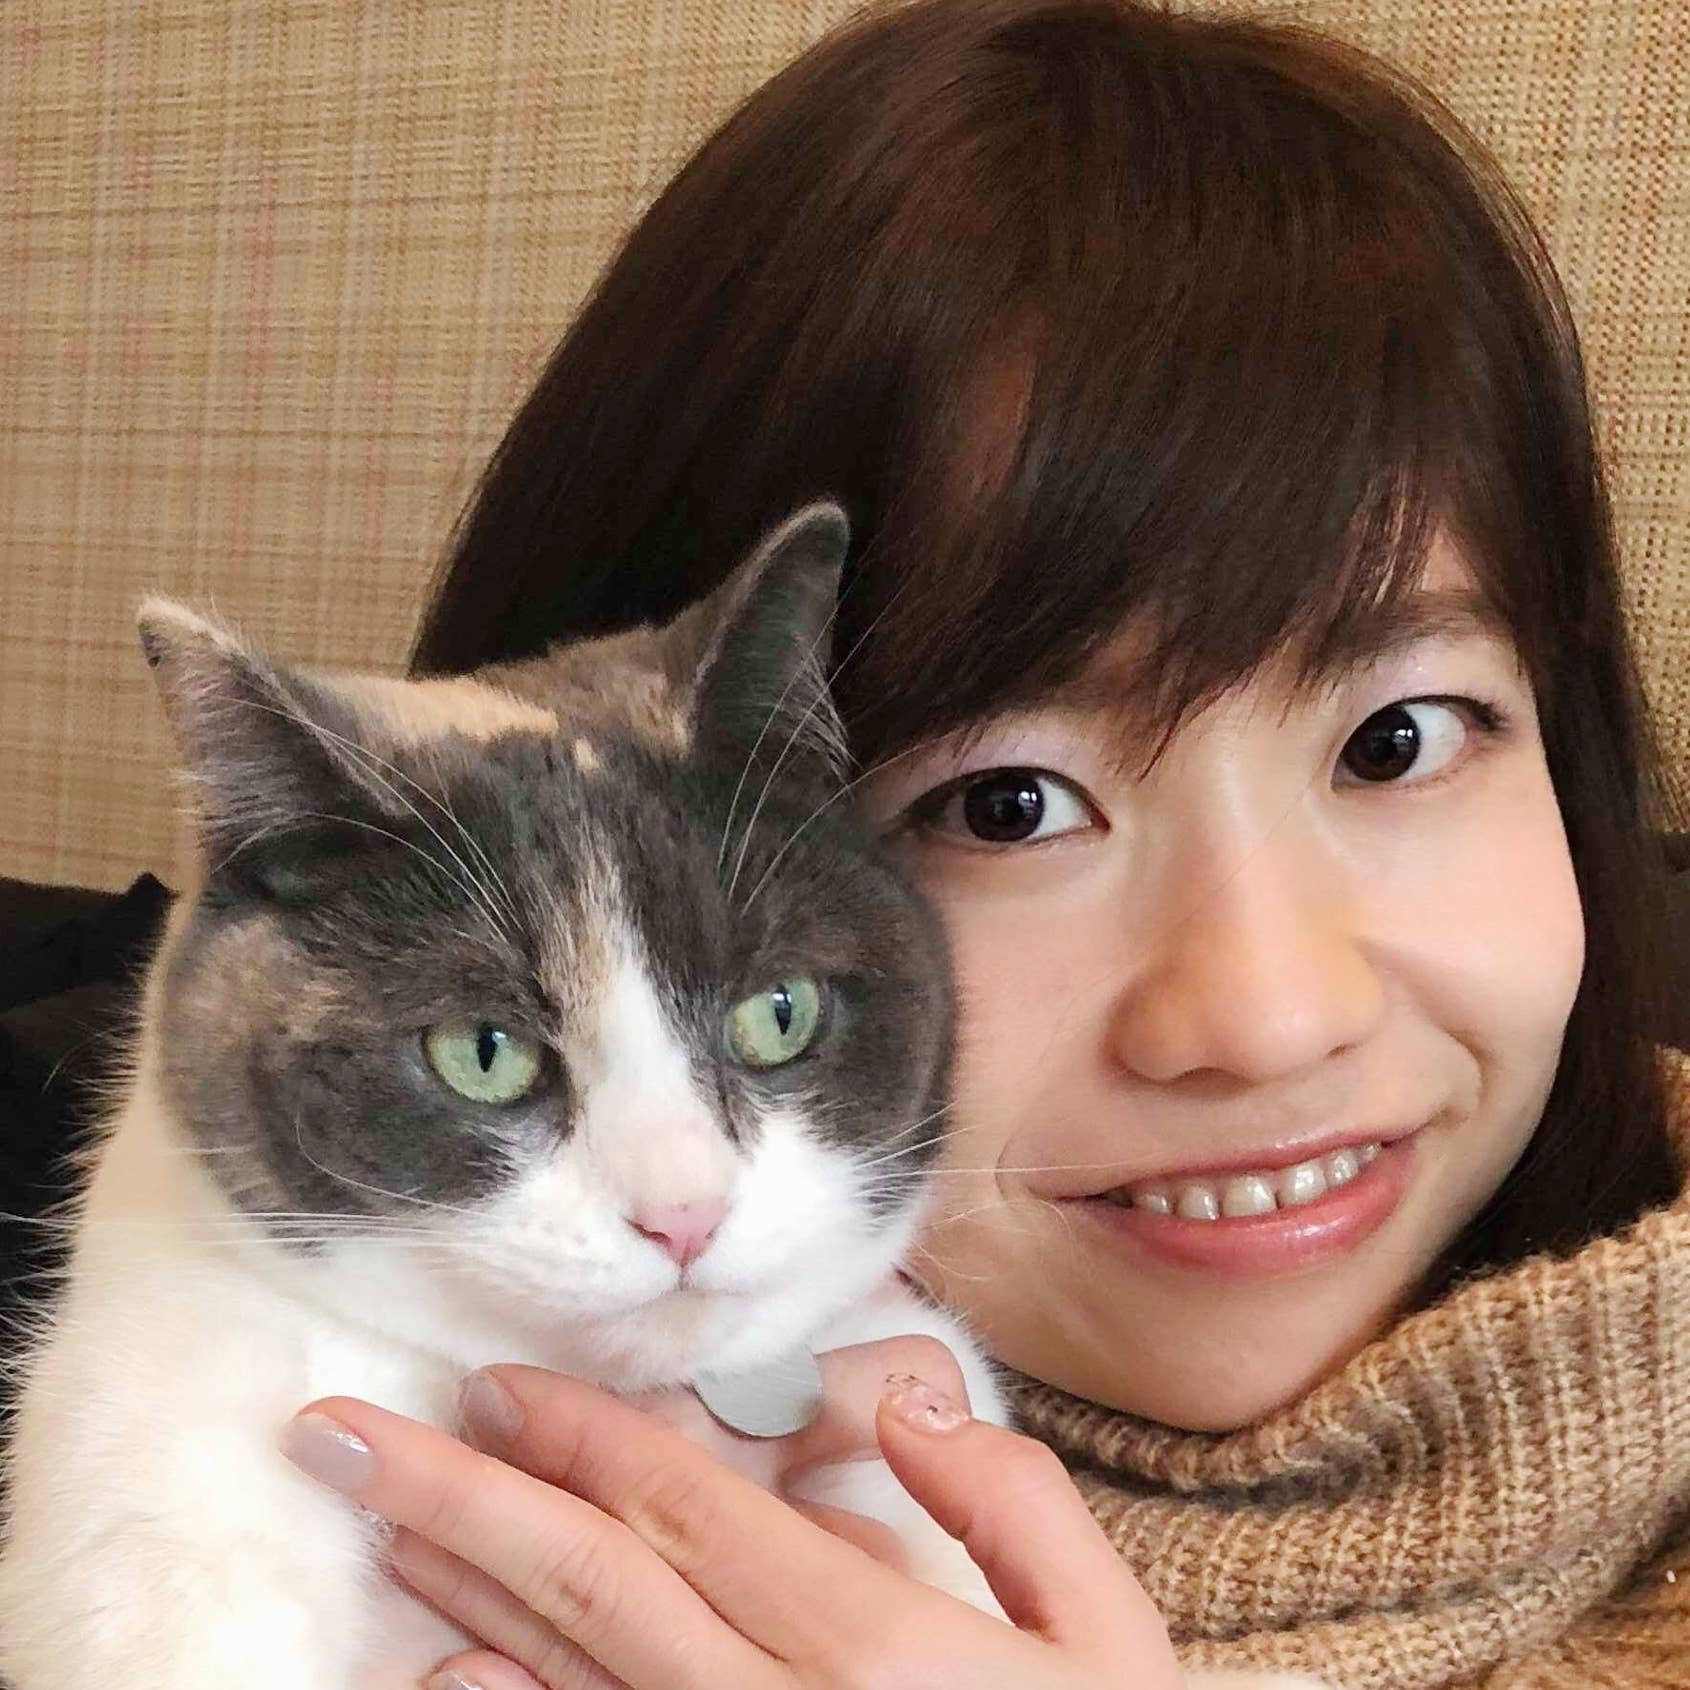 Miki Sugiyama